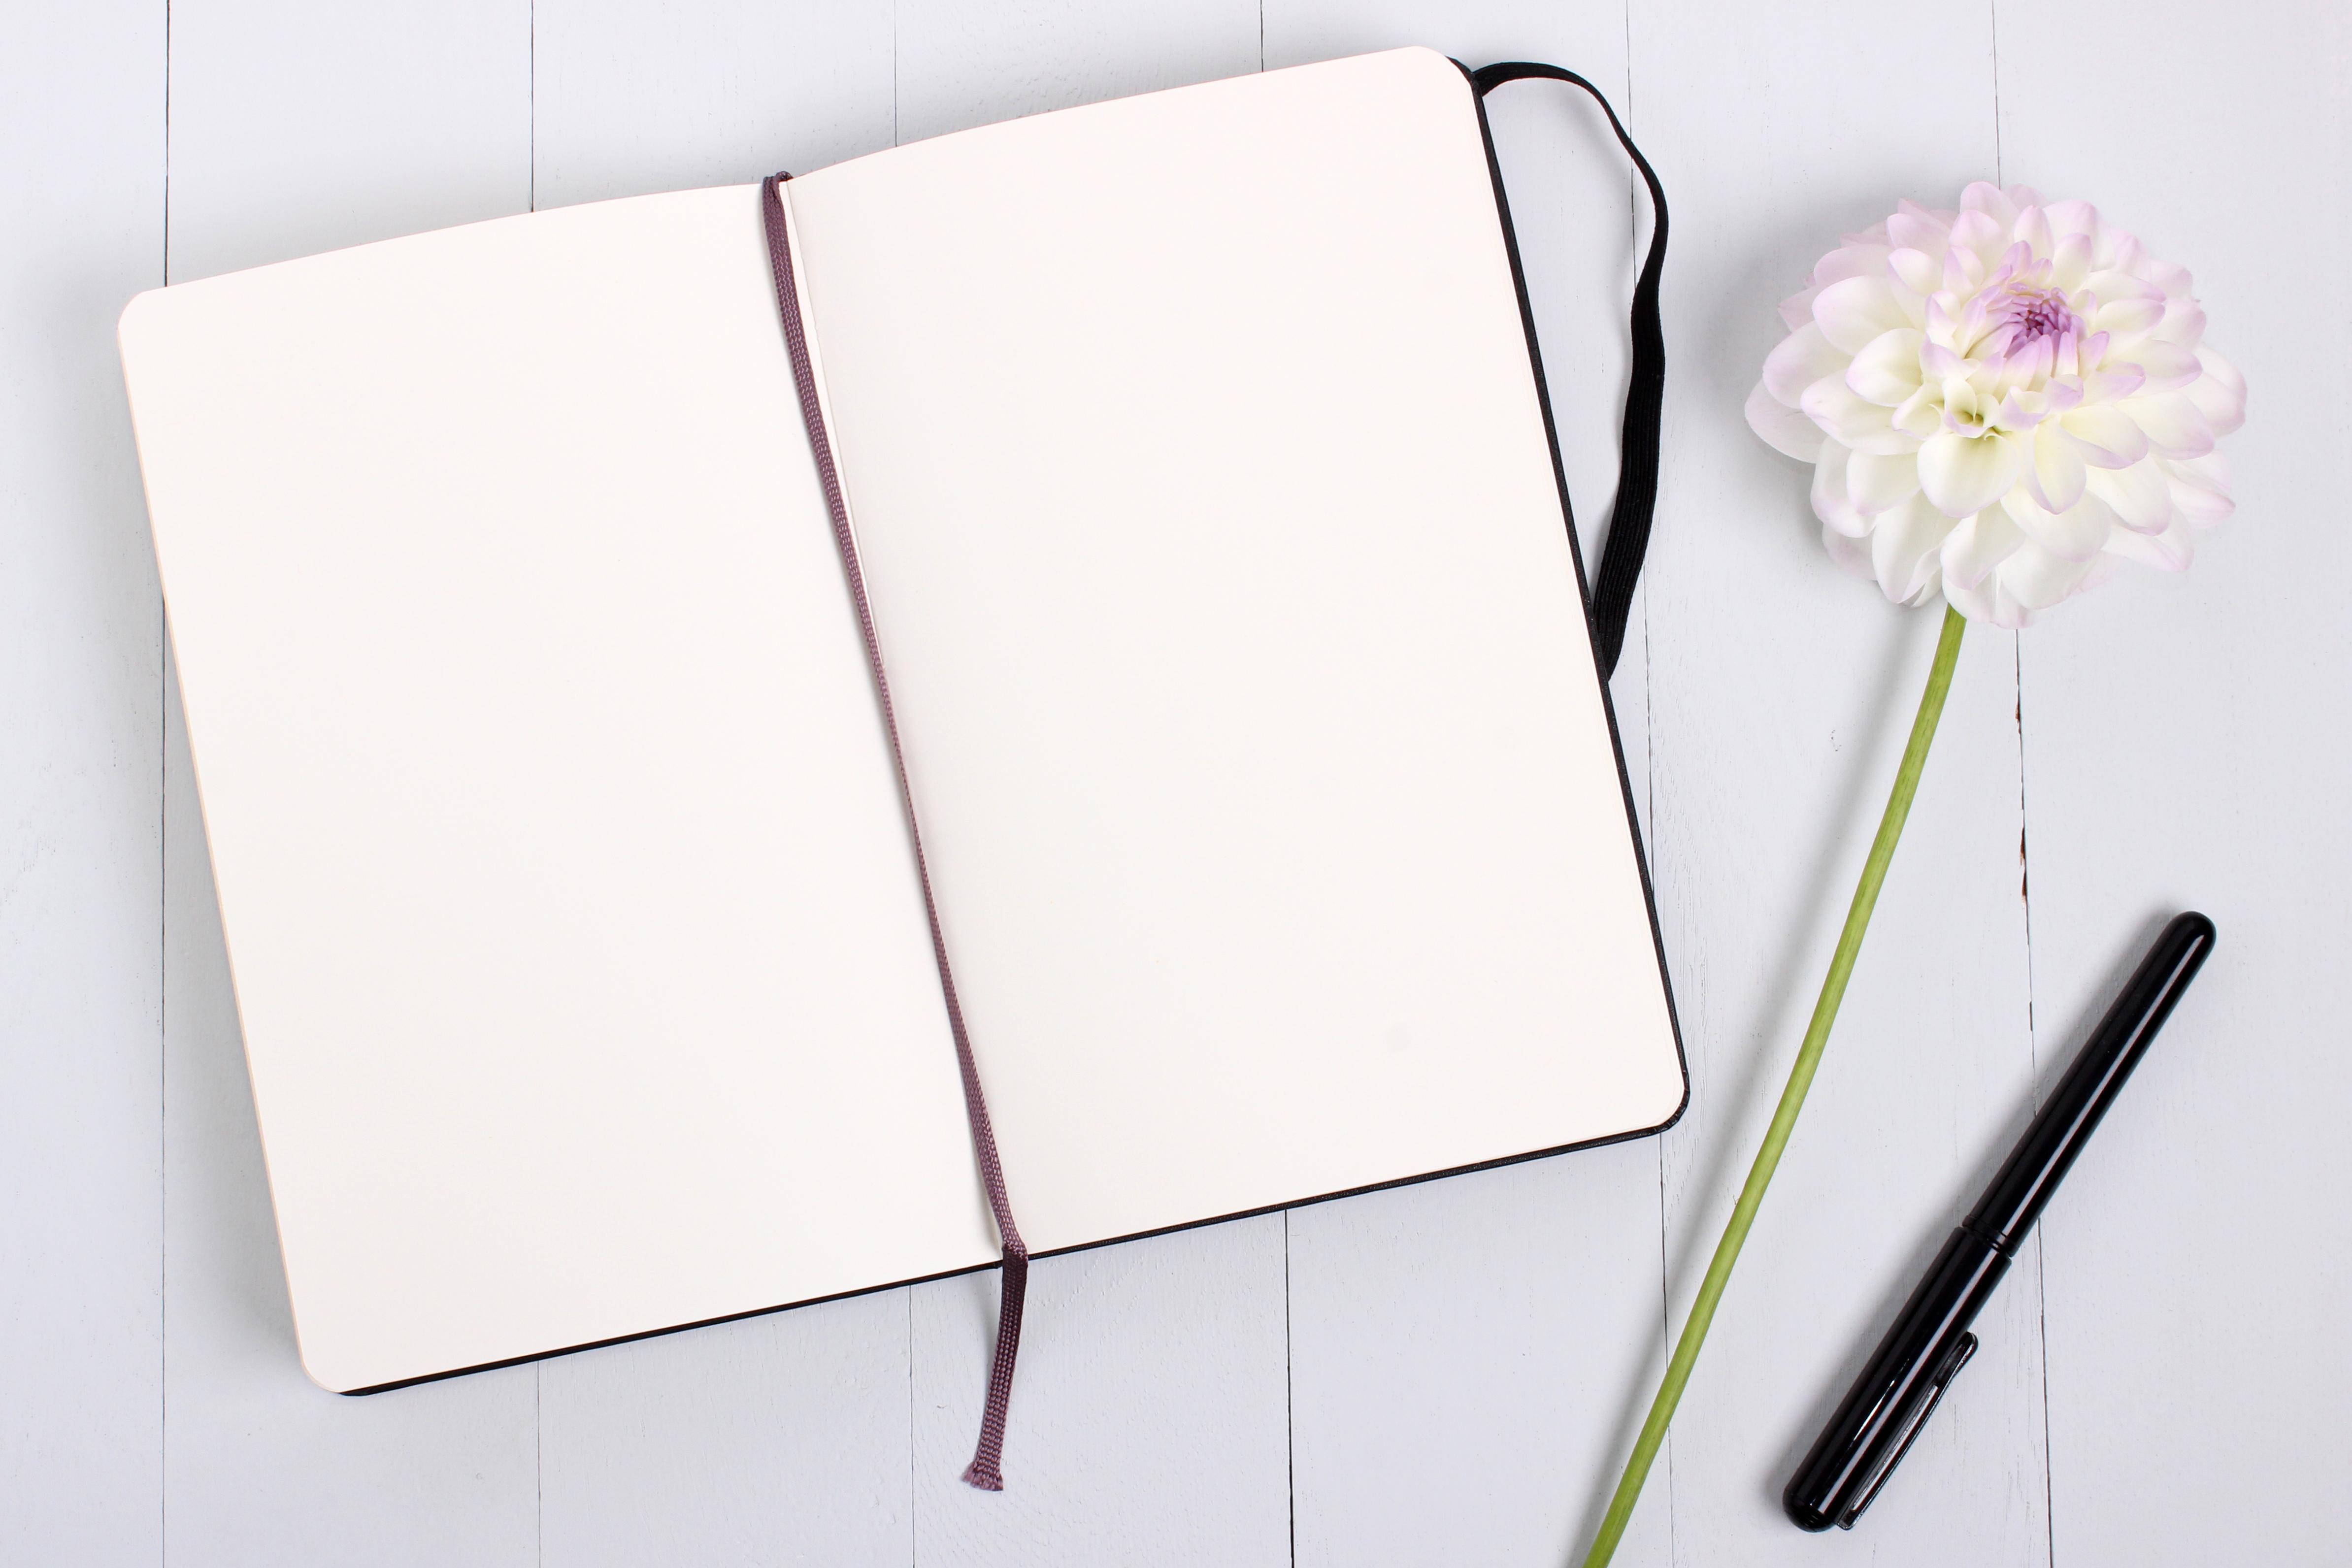 Canva - Notebook And Black Ballpoint Pen.jpg